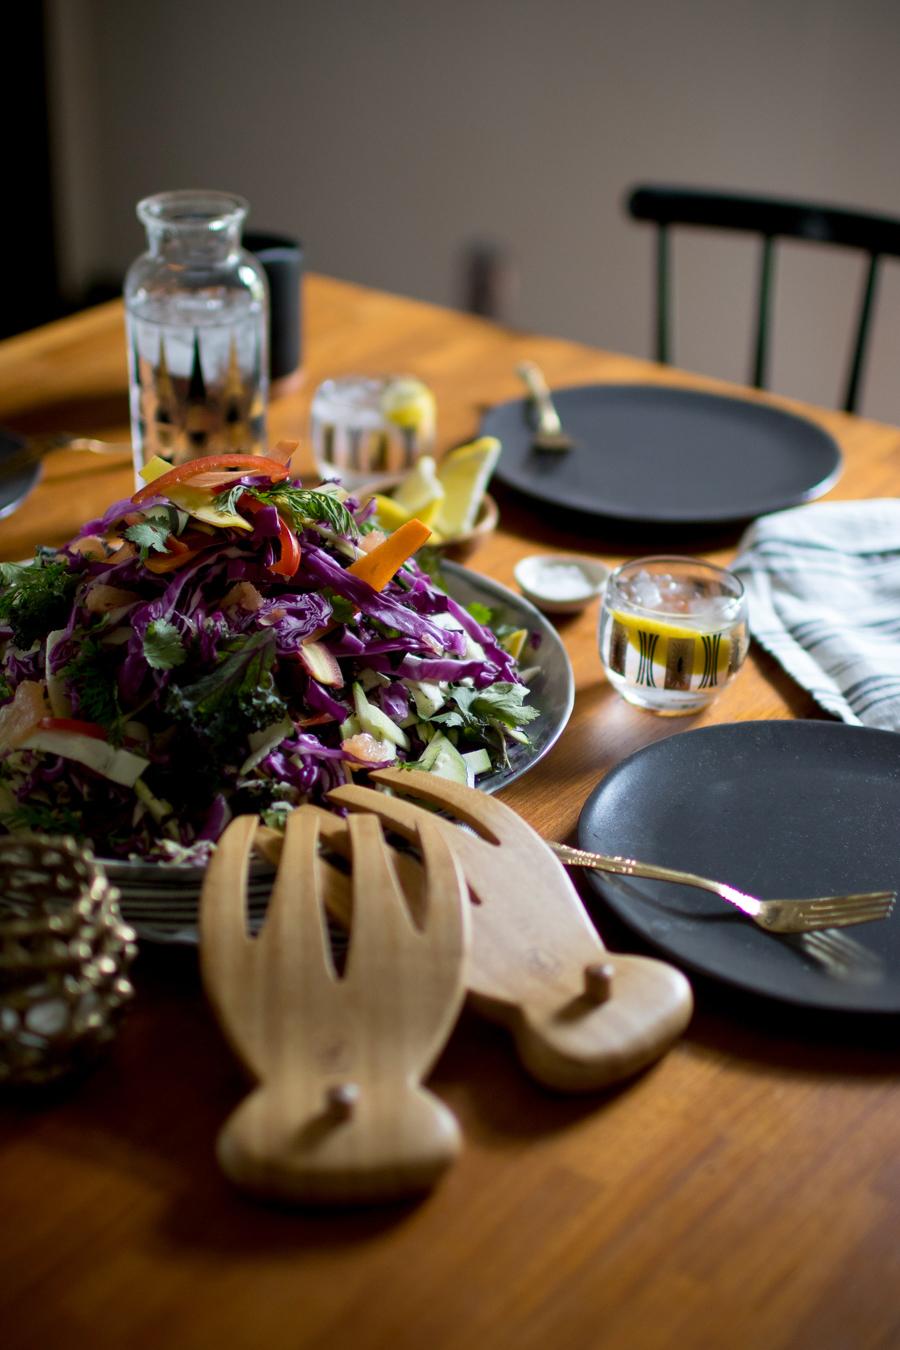 VegetarianVenturesThaiSaladSM (42 of 51) copy